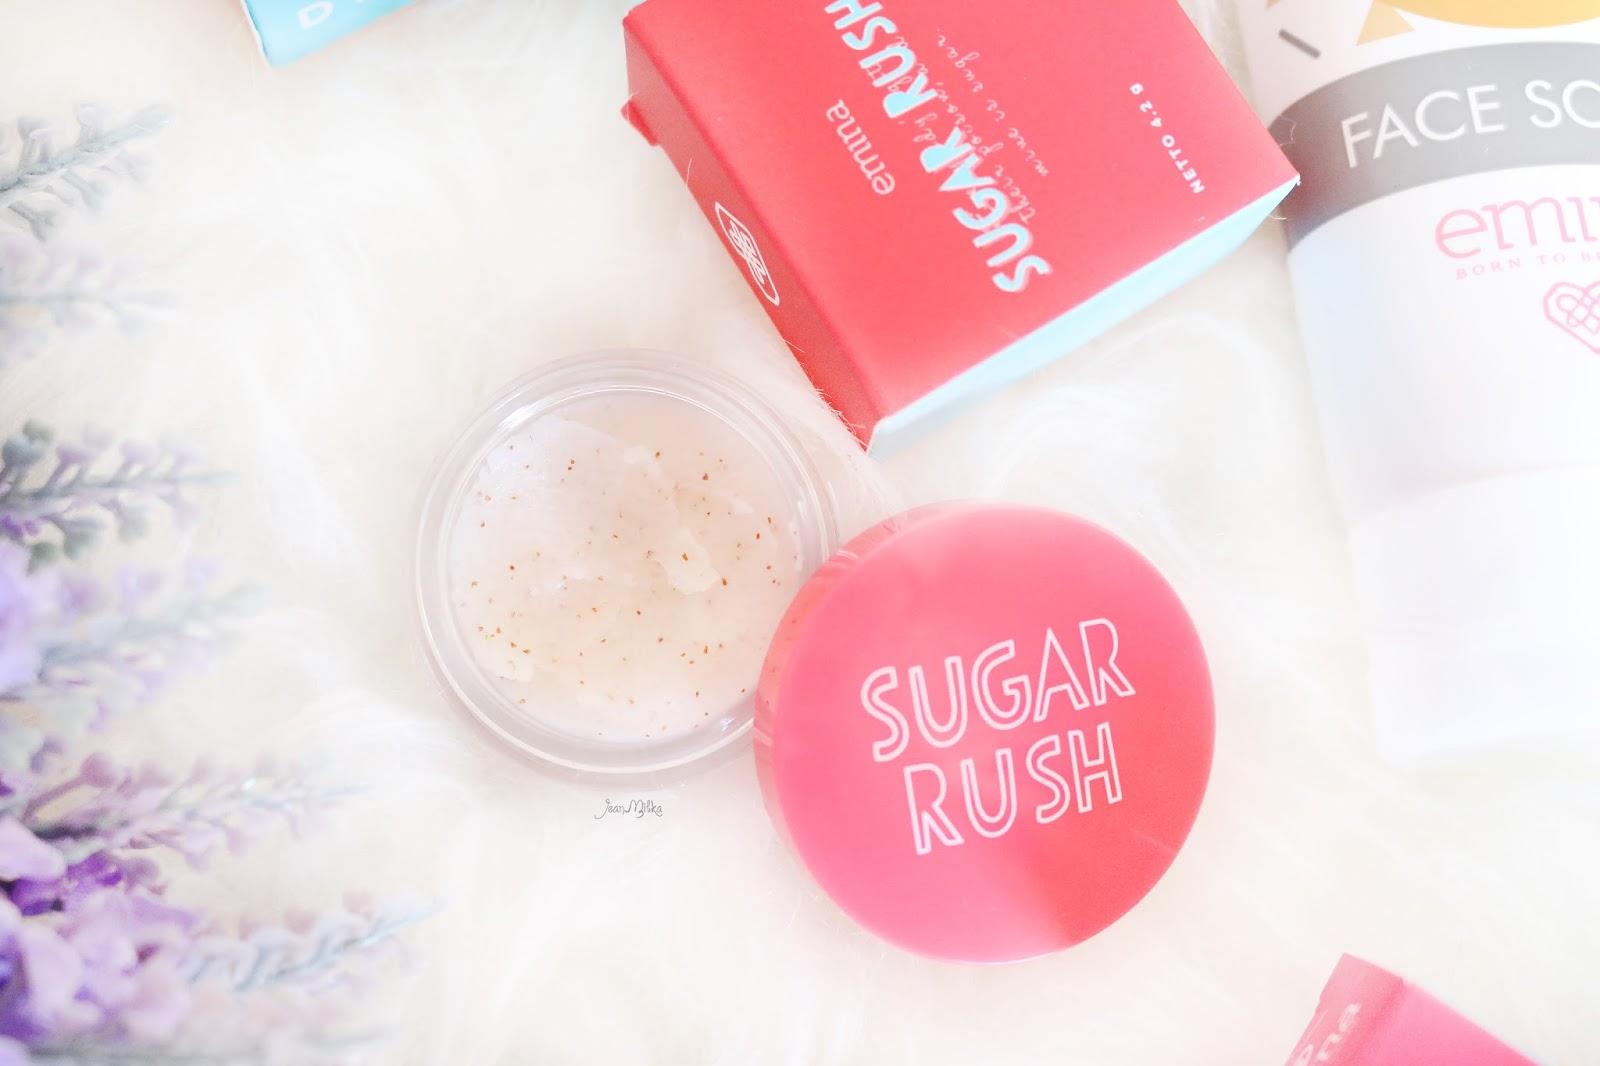 emina, emina cosmetics, emina sugar rush, sugar rush, sugar rush scrub, sugar rush lip scrub, sugar rush lipstick, kosmetik murah, kosmetik indonesia, emina collection